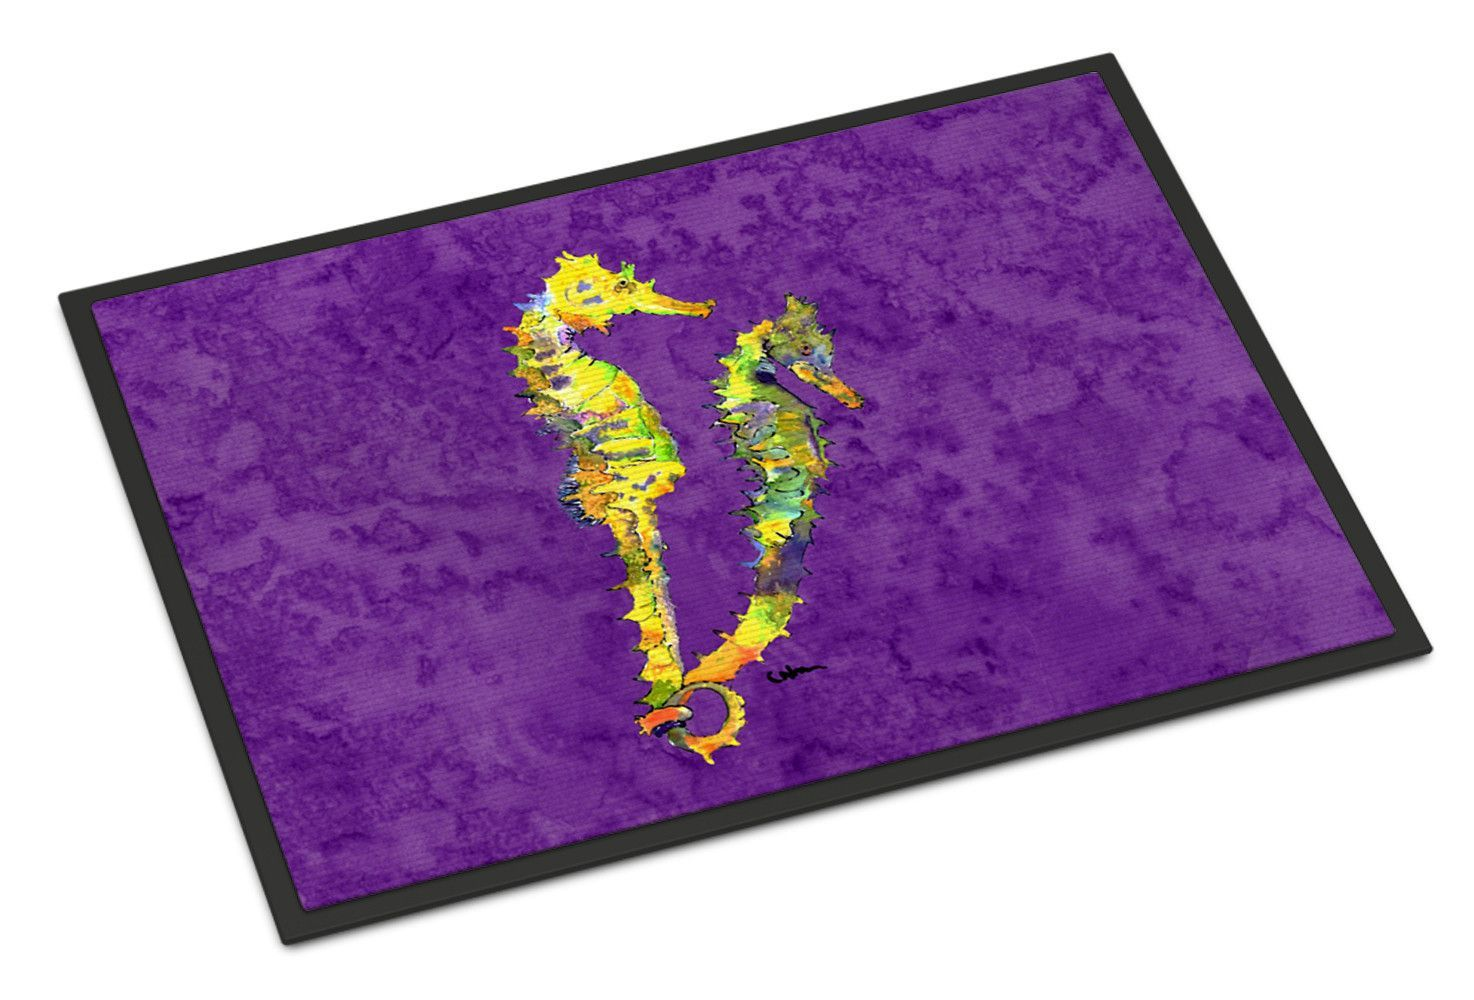 Fußboden Teppich Yasin ~ Seahorse indoor or outdoor mat 24x36 doormat products pinterest